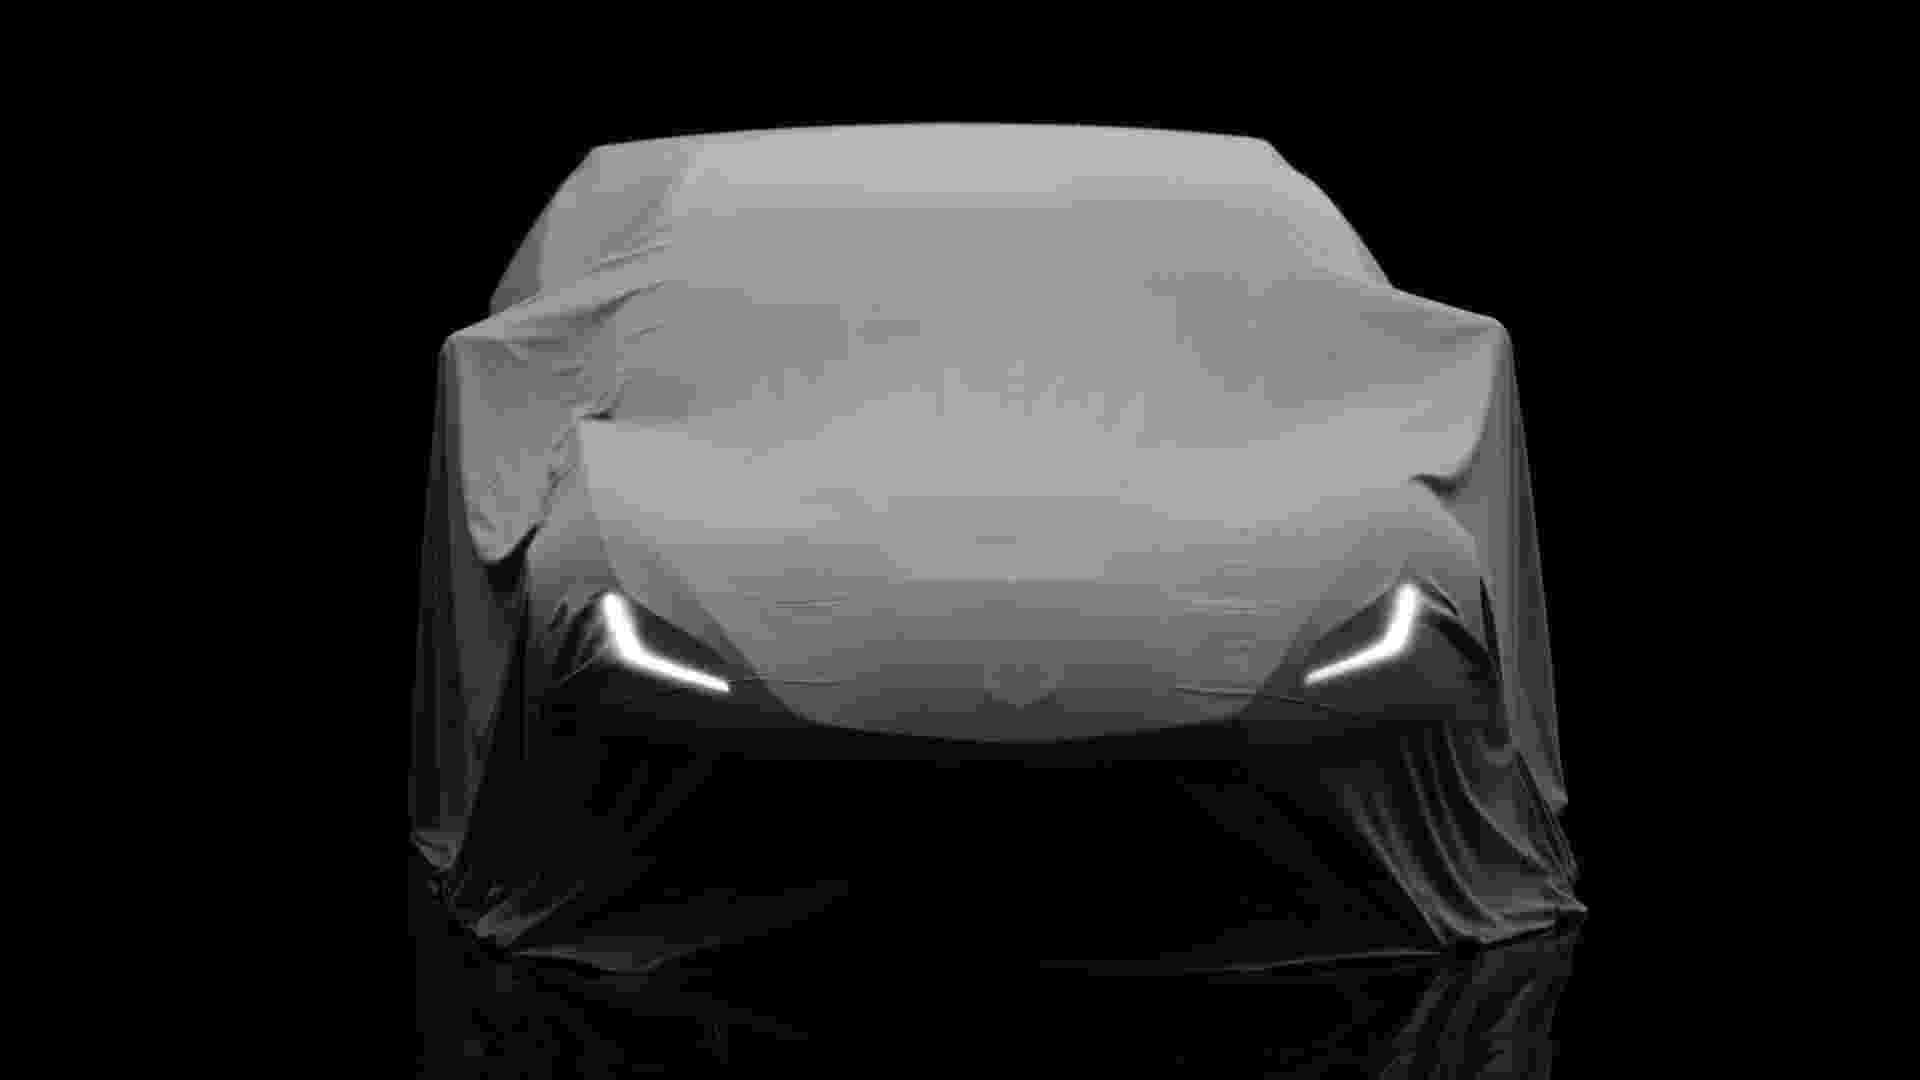 Chevrolet Corvette Stingray 2014 - Paul Sancya/AP